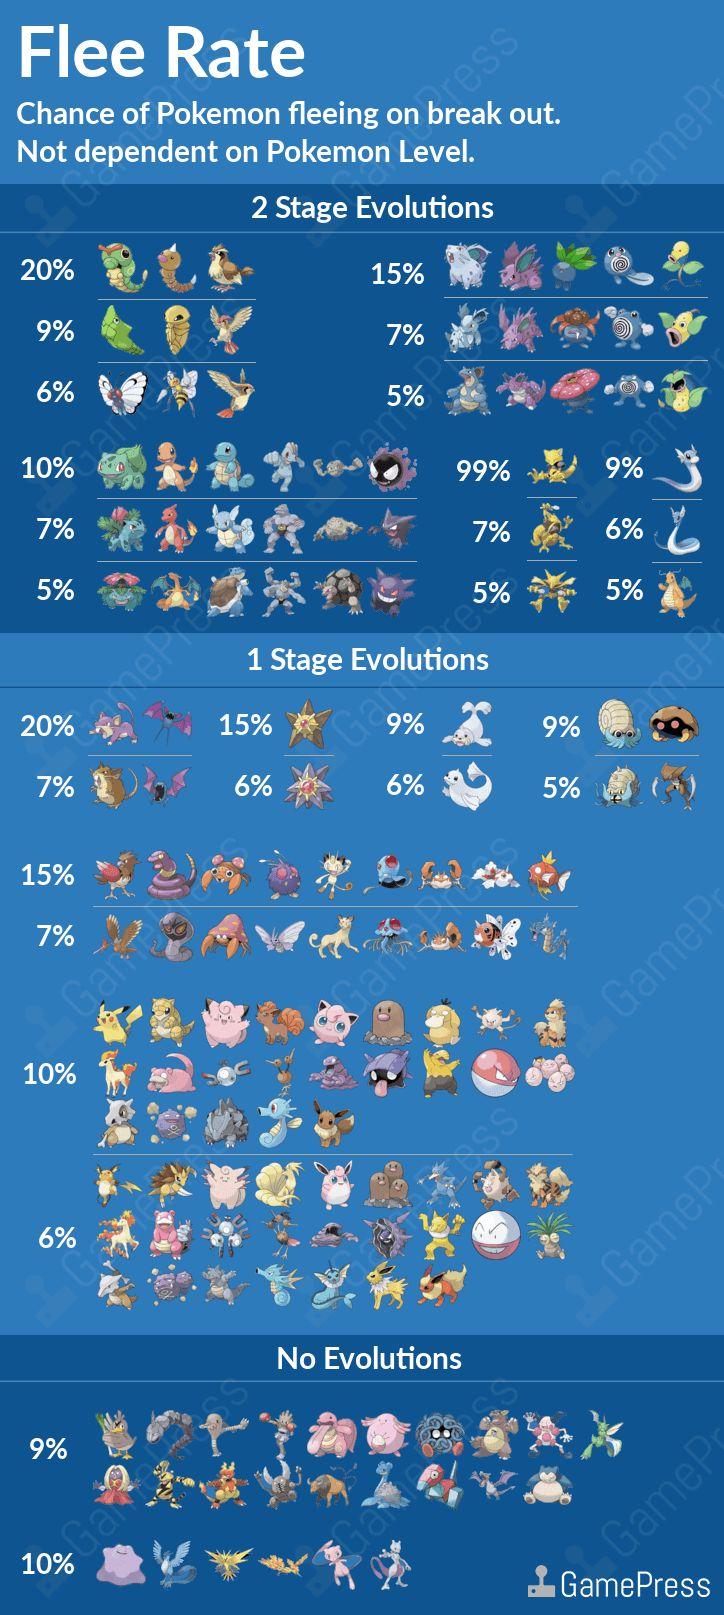 Pokemon GO Database, News, Strategy, and Community for the Pokemon GO Player. LOVE Pokemon? Visit us: www.PokeMansion.Com